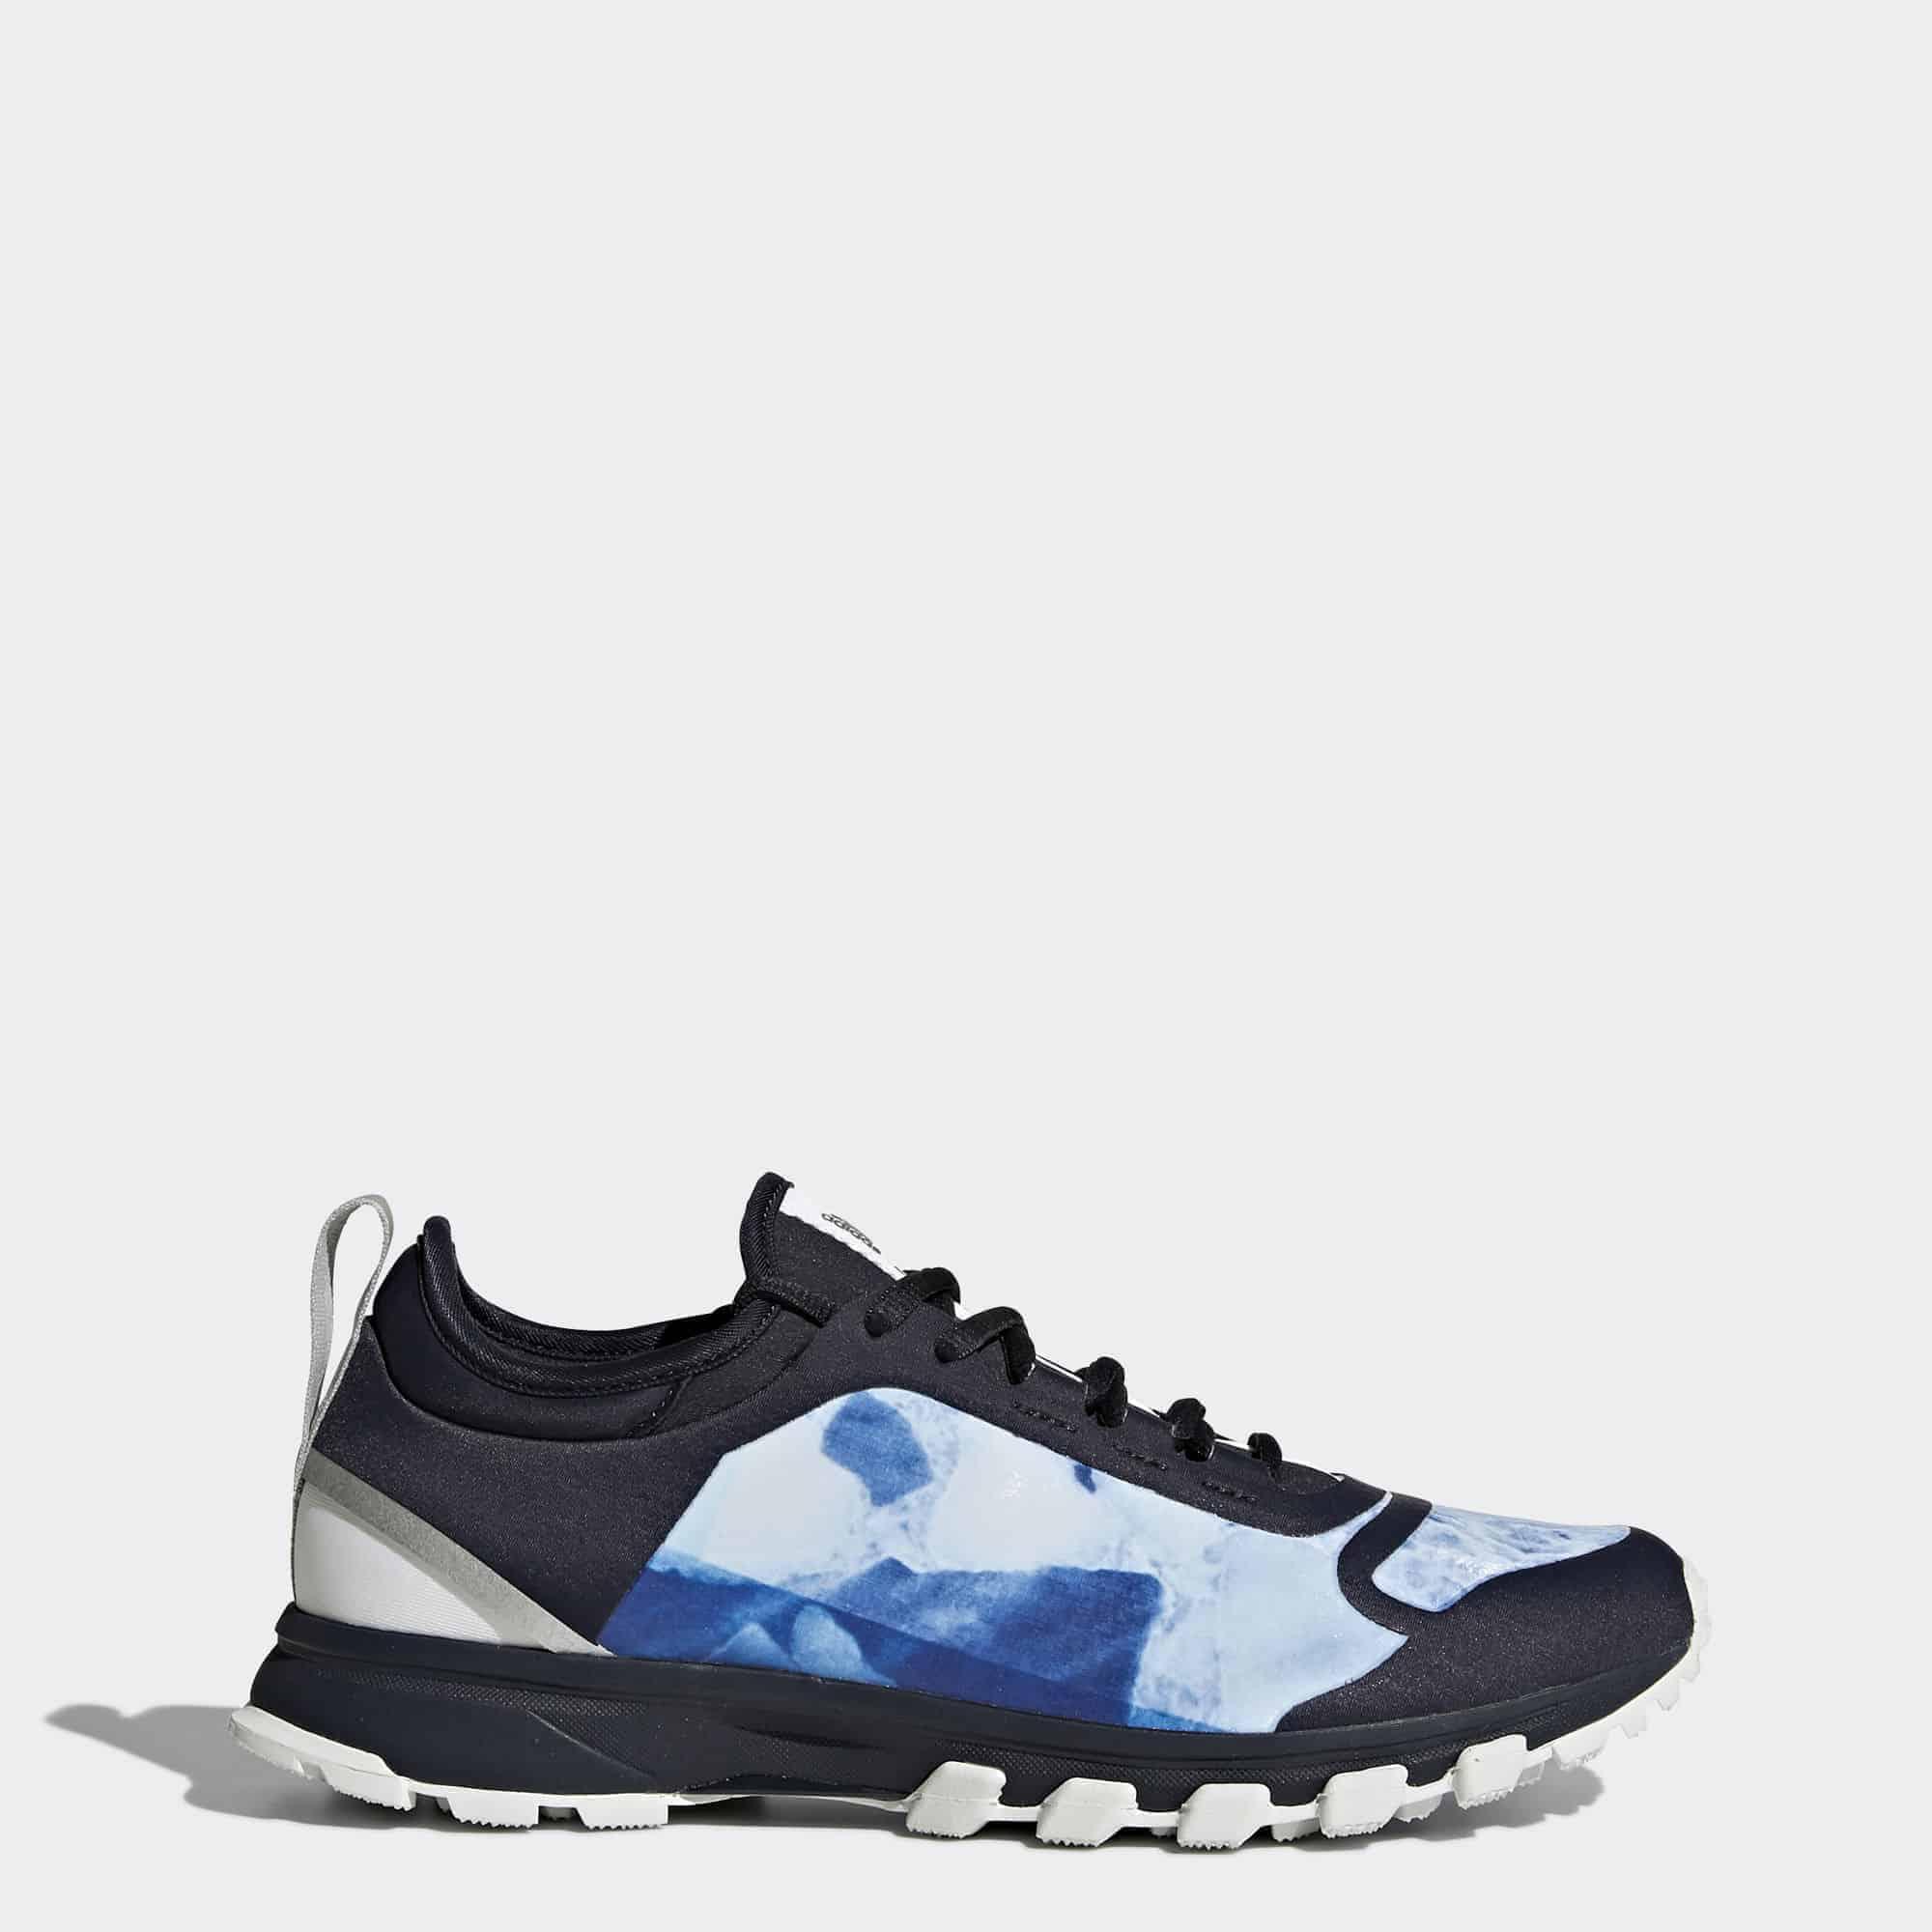 Кроссовки для бега Adidas Adizero XT by Stella McCartney женские